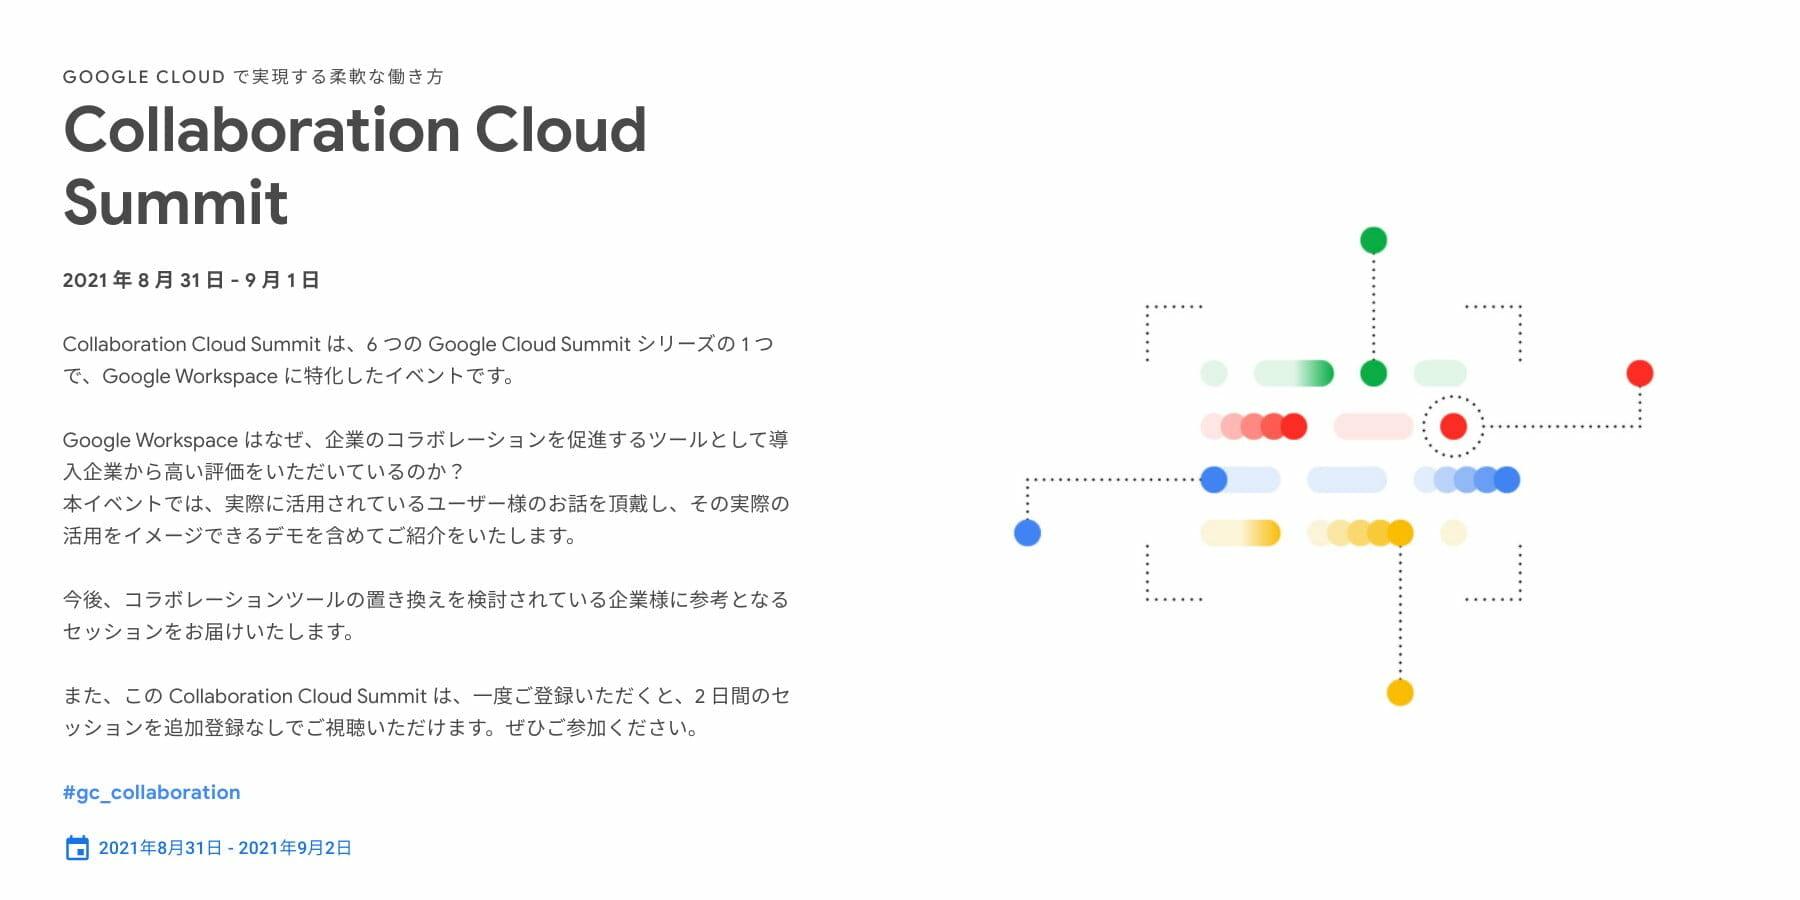 [GCP] Collaboration Cloud Summit